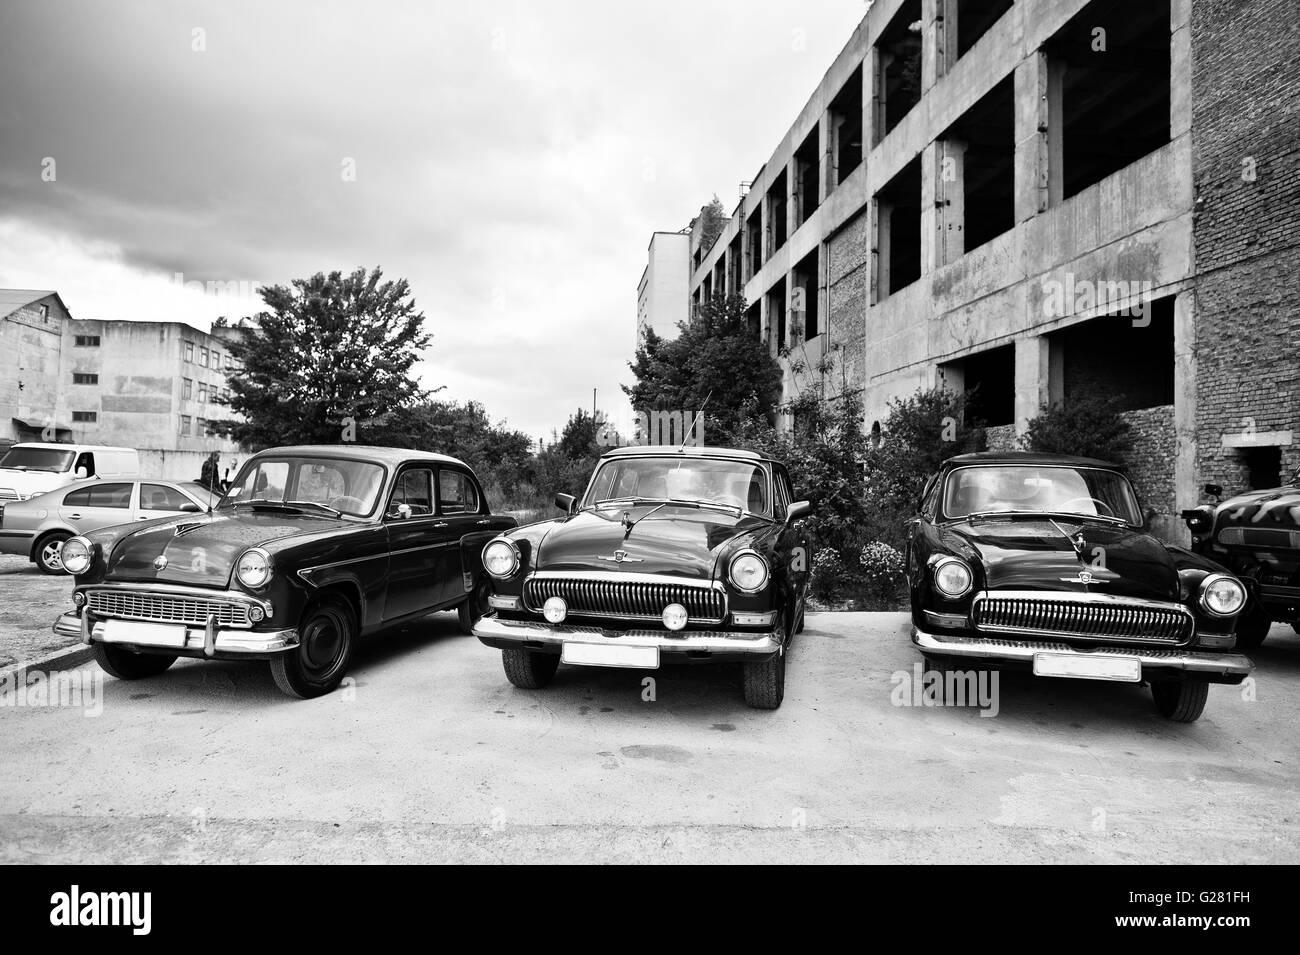 Podol, Ukraine  May 19, 2016 Classic Soviet Retro Cars